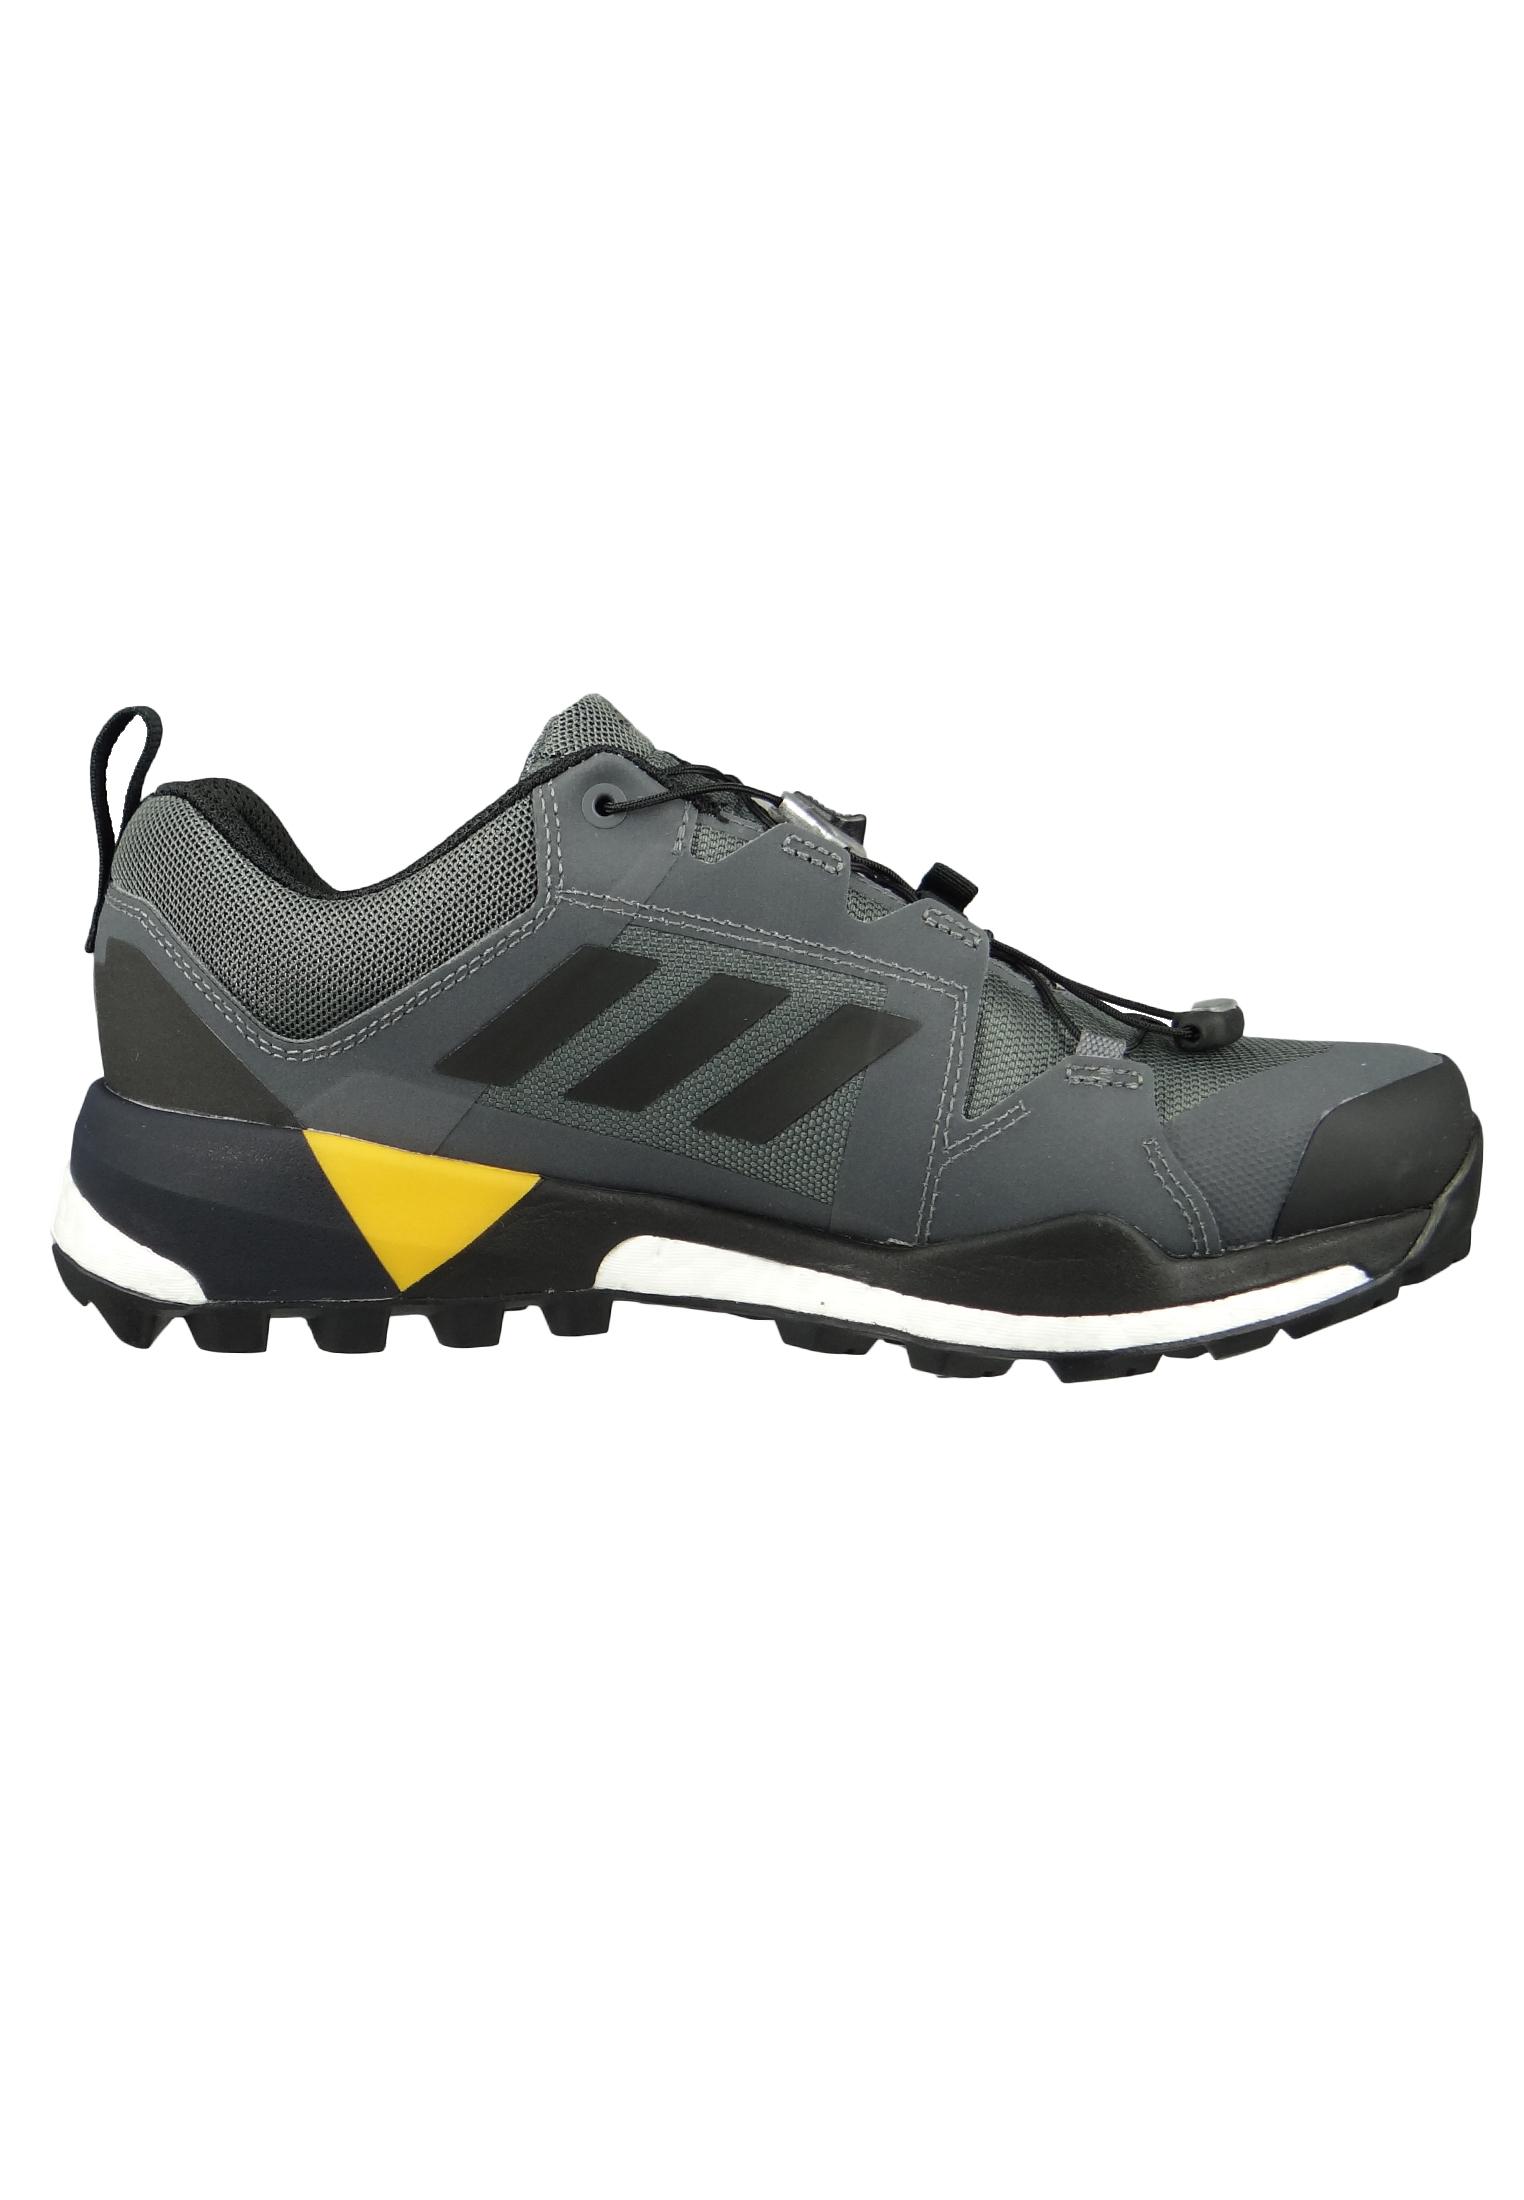 adidas TERREX SKYCHASER XT GTX G26549 Herren Trailrunning